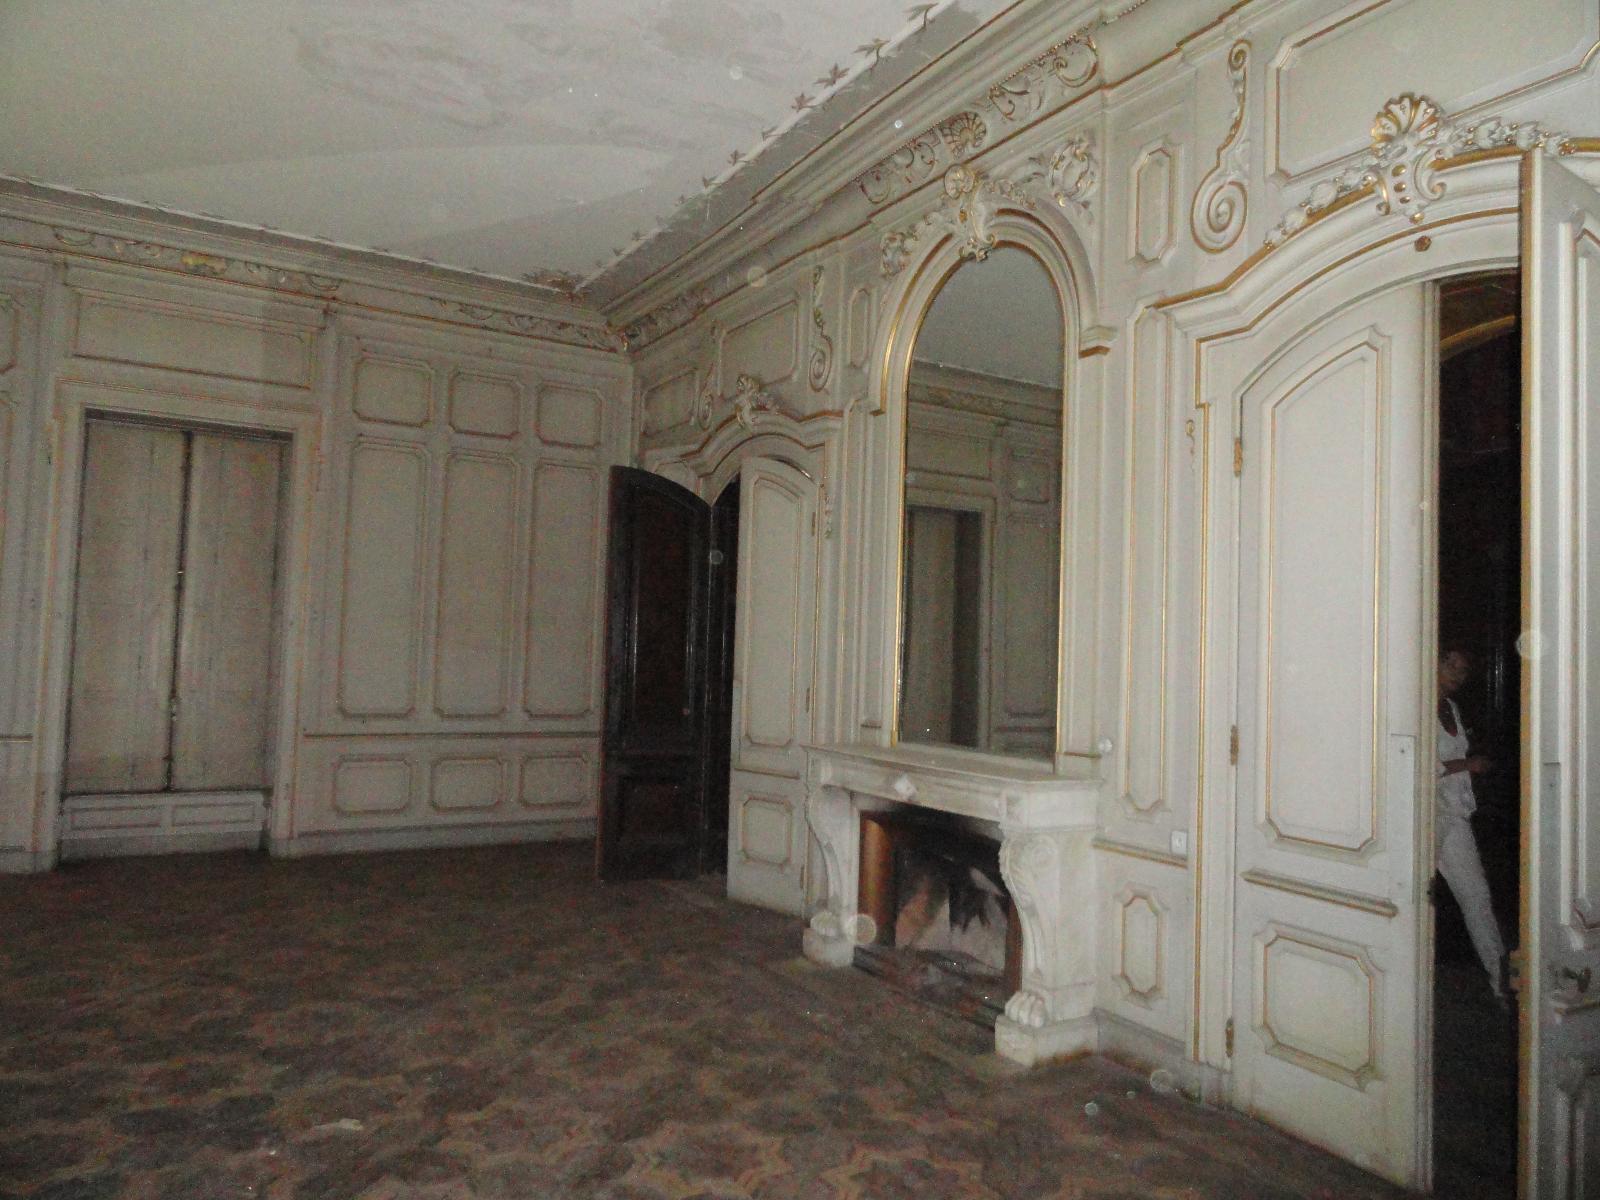 chateau a vendre villefranche sur saone 700 m2 650000 immobilier jarnioux agence. Black Bedroom Furniture Sets. Home Design Ideas